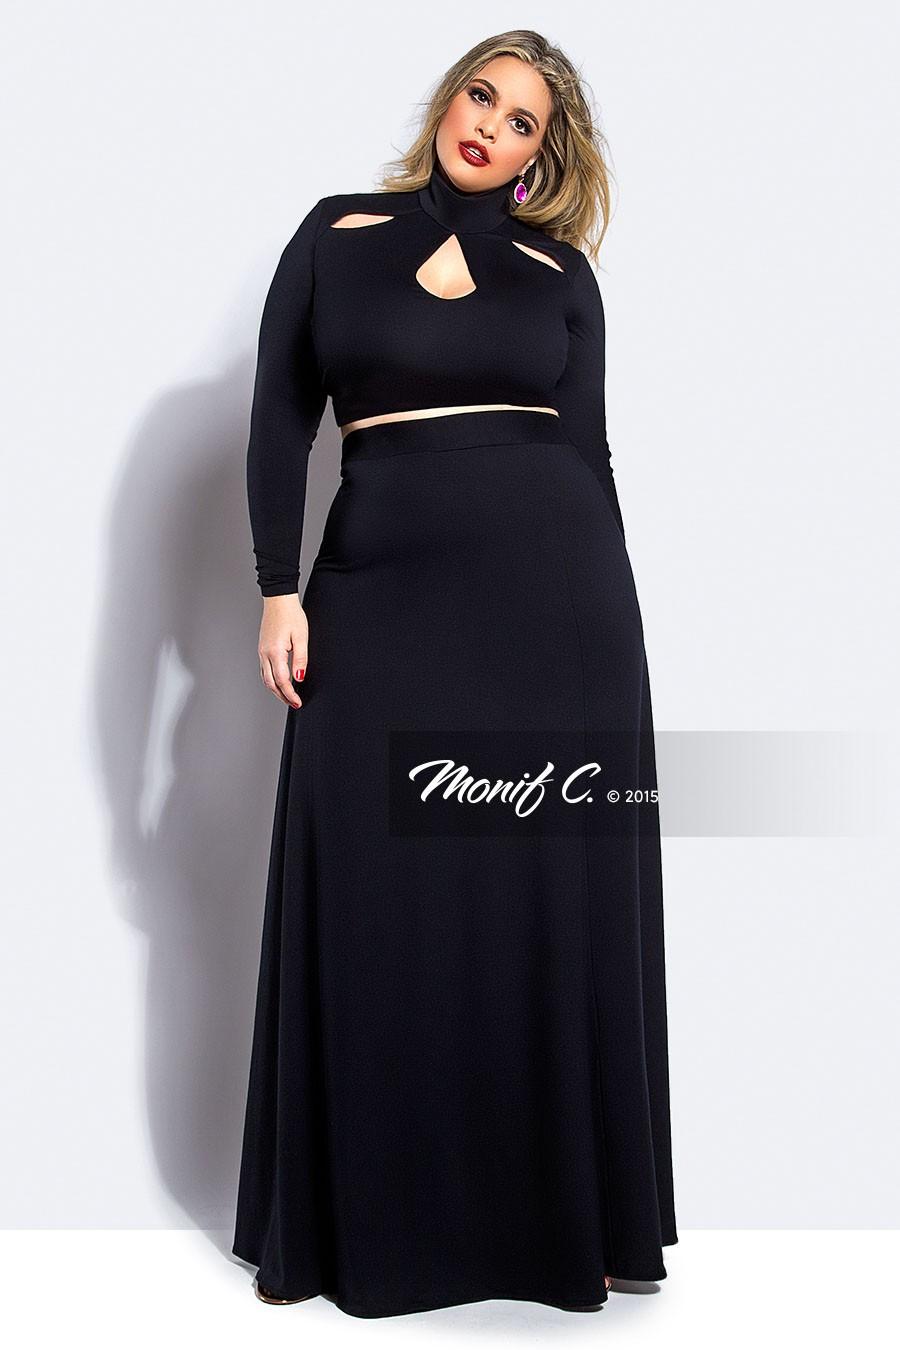 Black Maxi Skirt With Crop Top